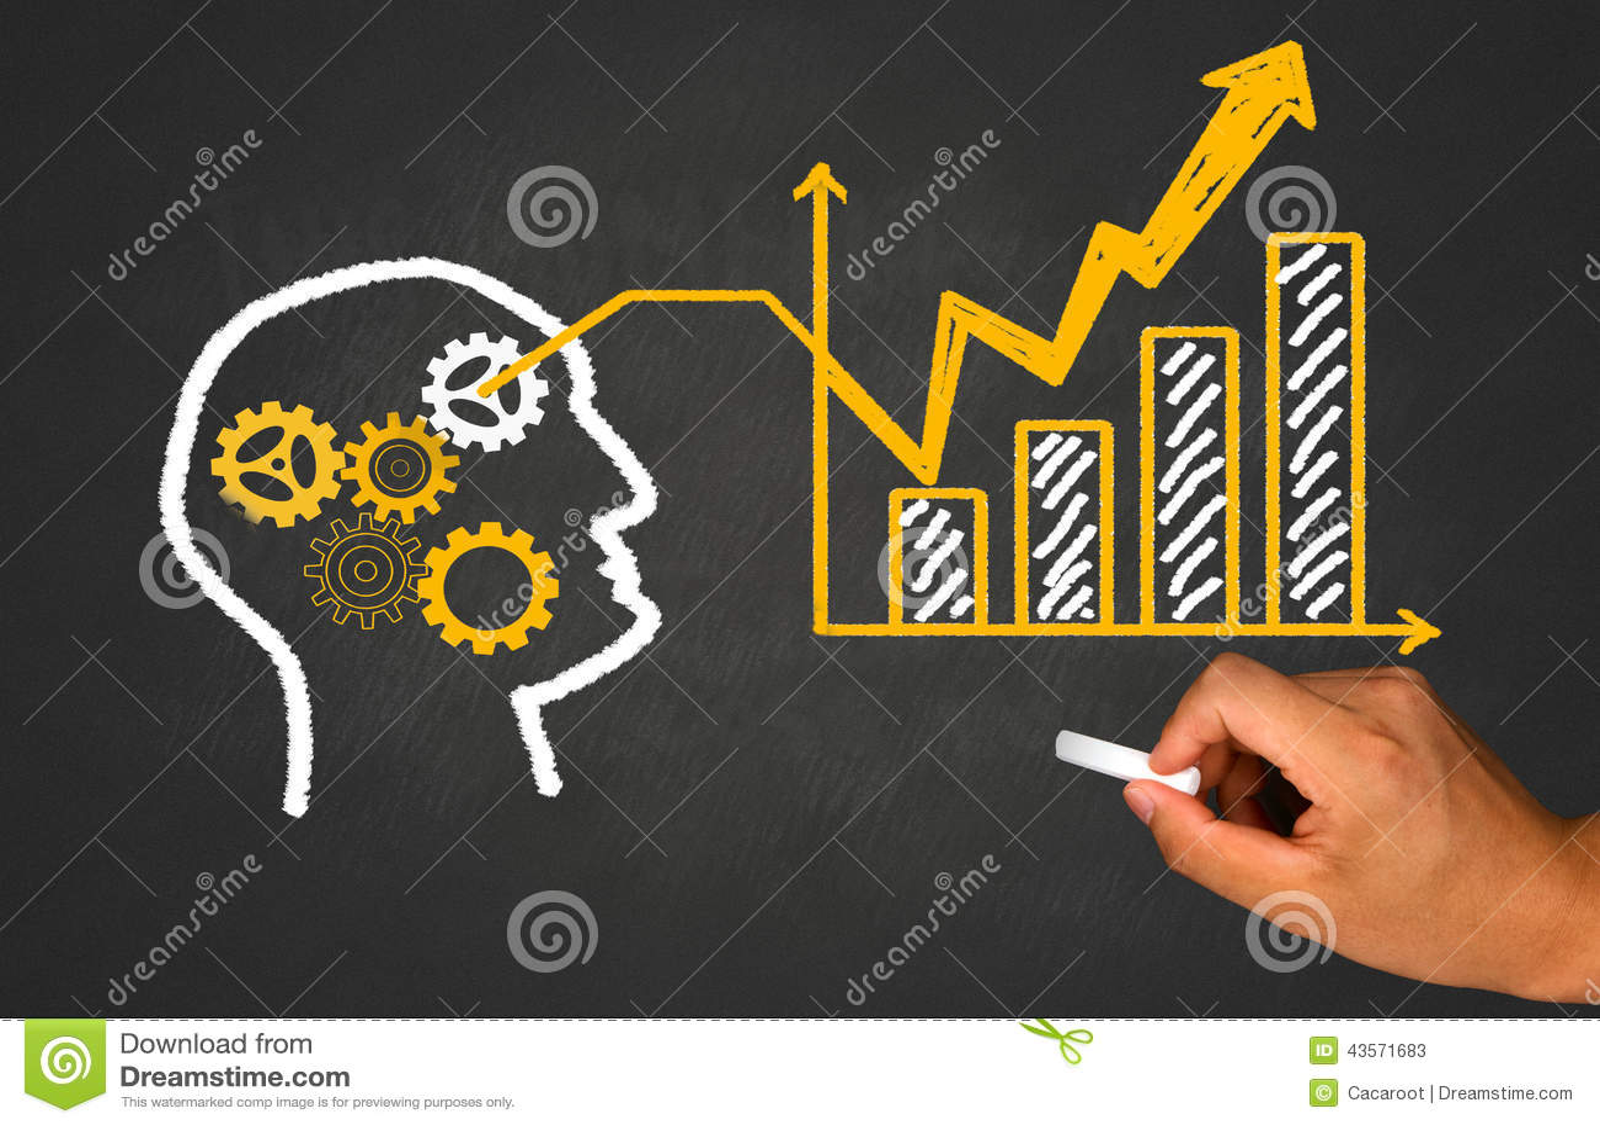 Idea, teamwork and business concept